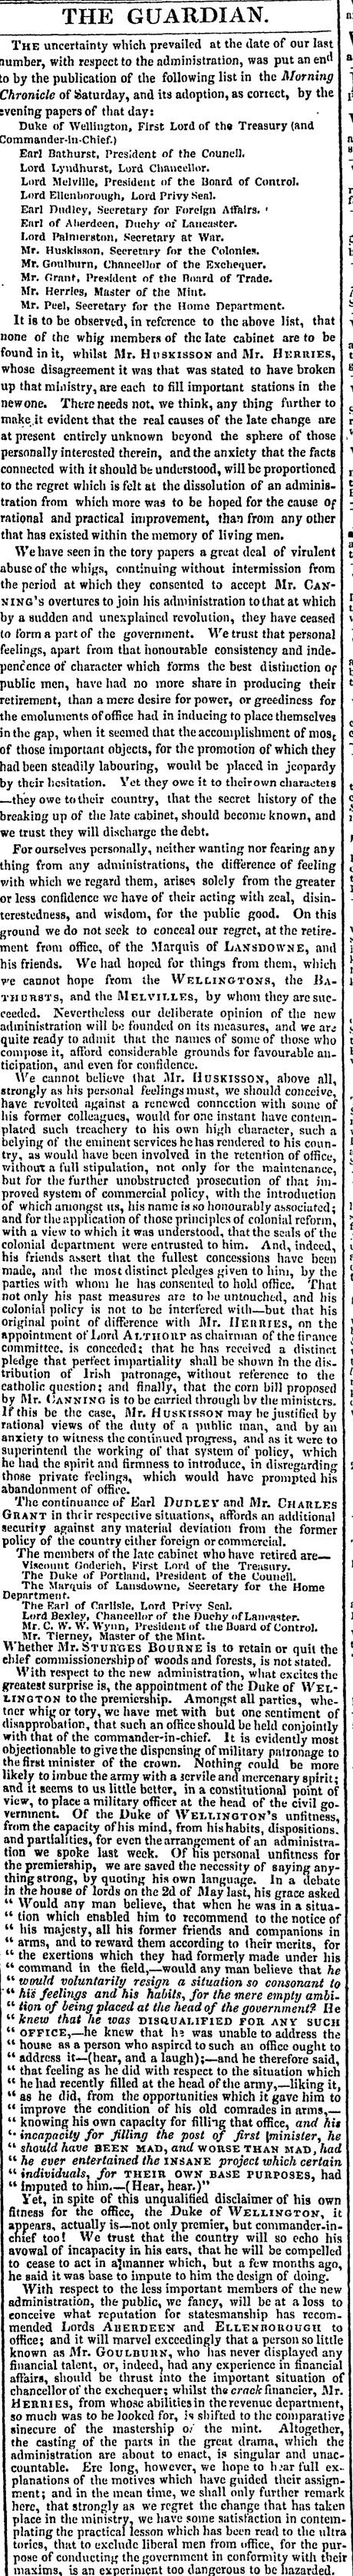 1828 Duke of Wellington editorial